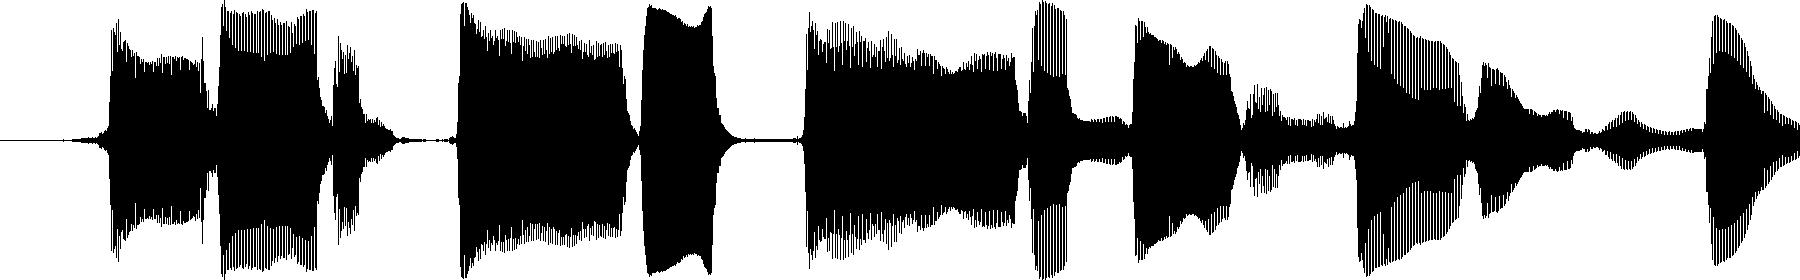 vedh sax lick 04 cm 124bpm